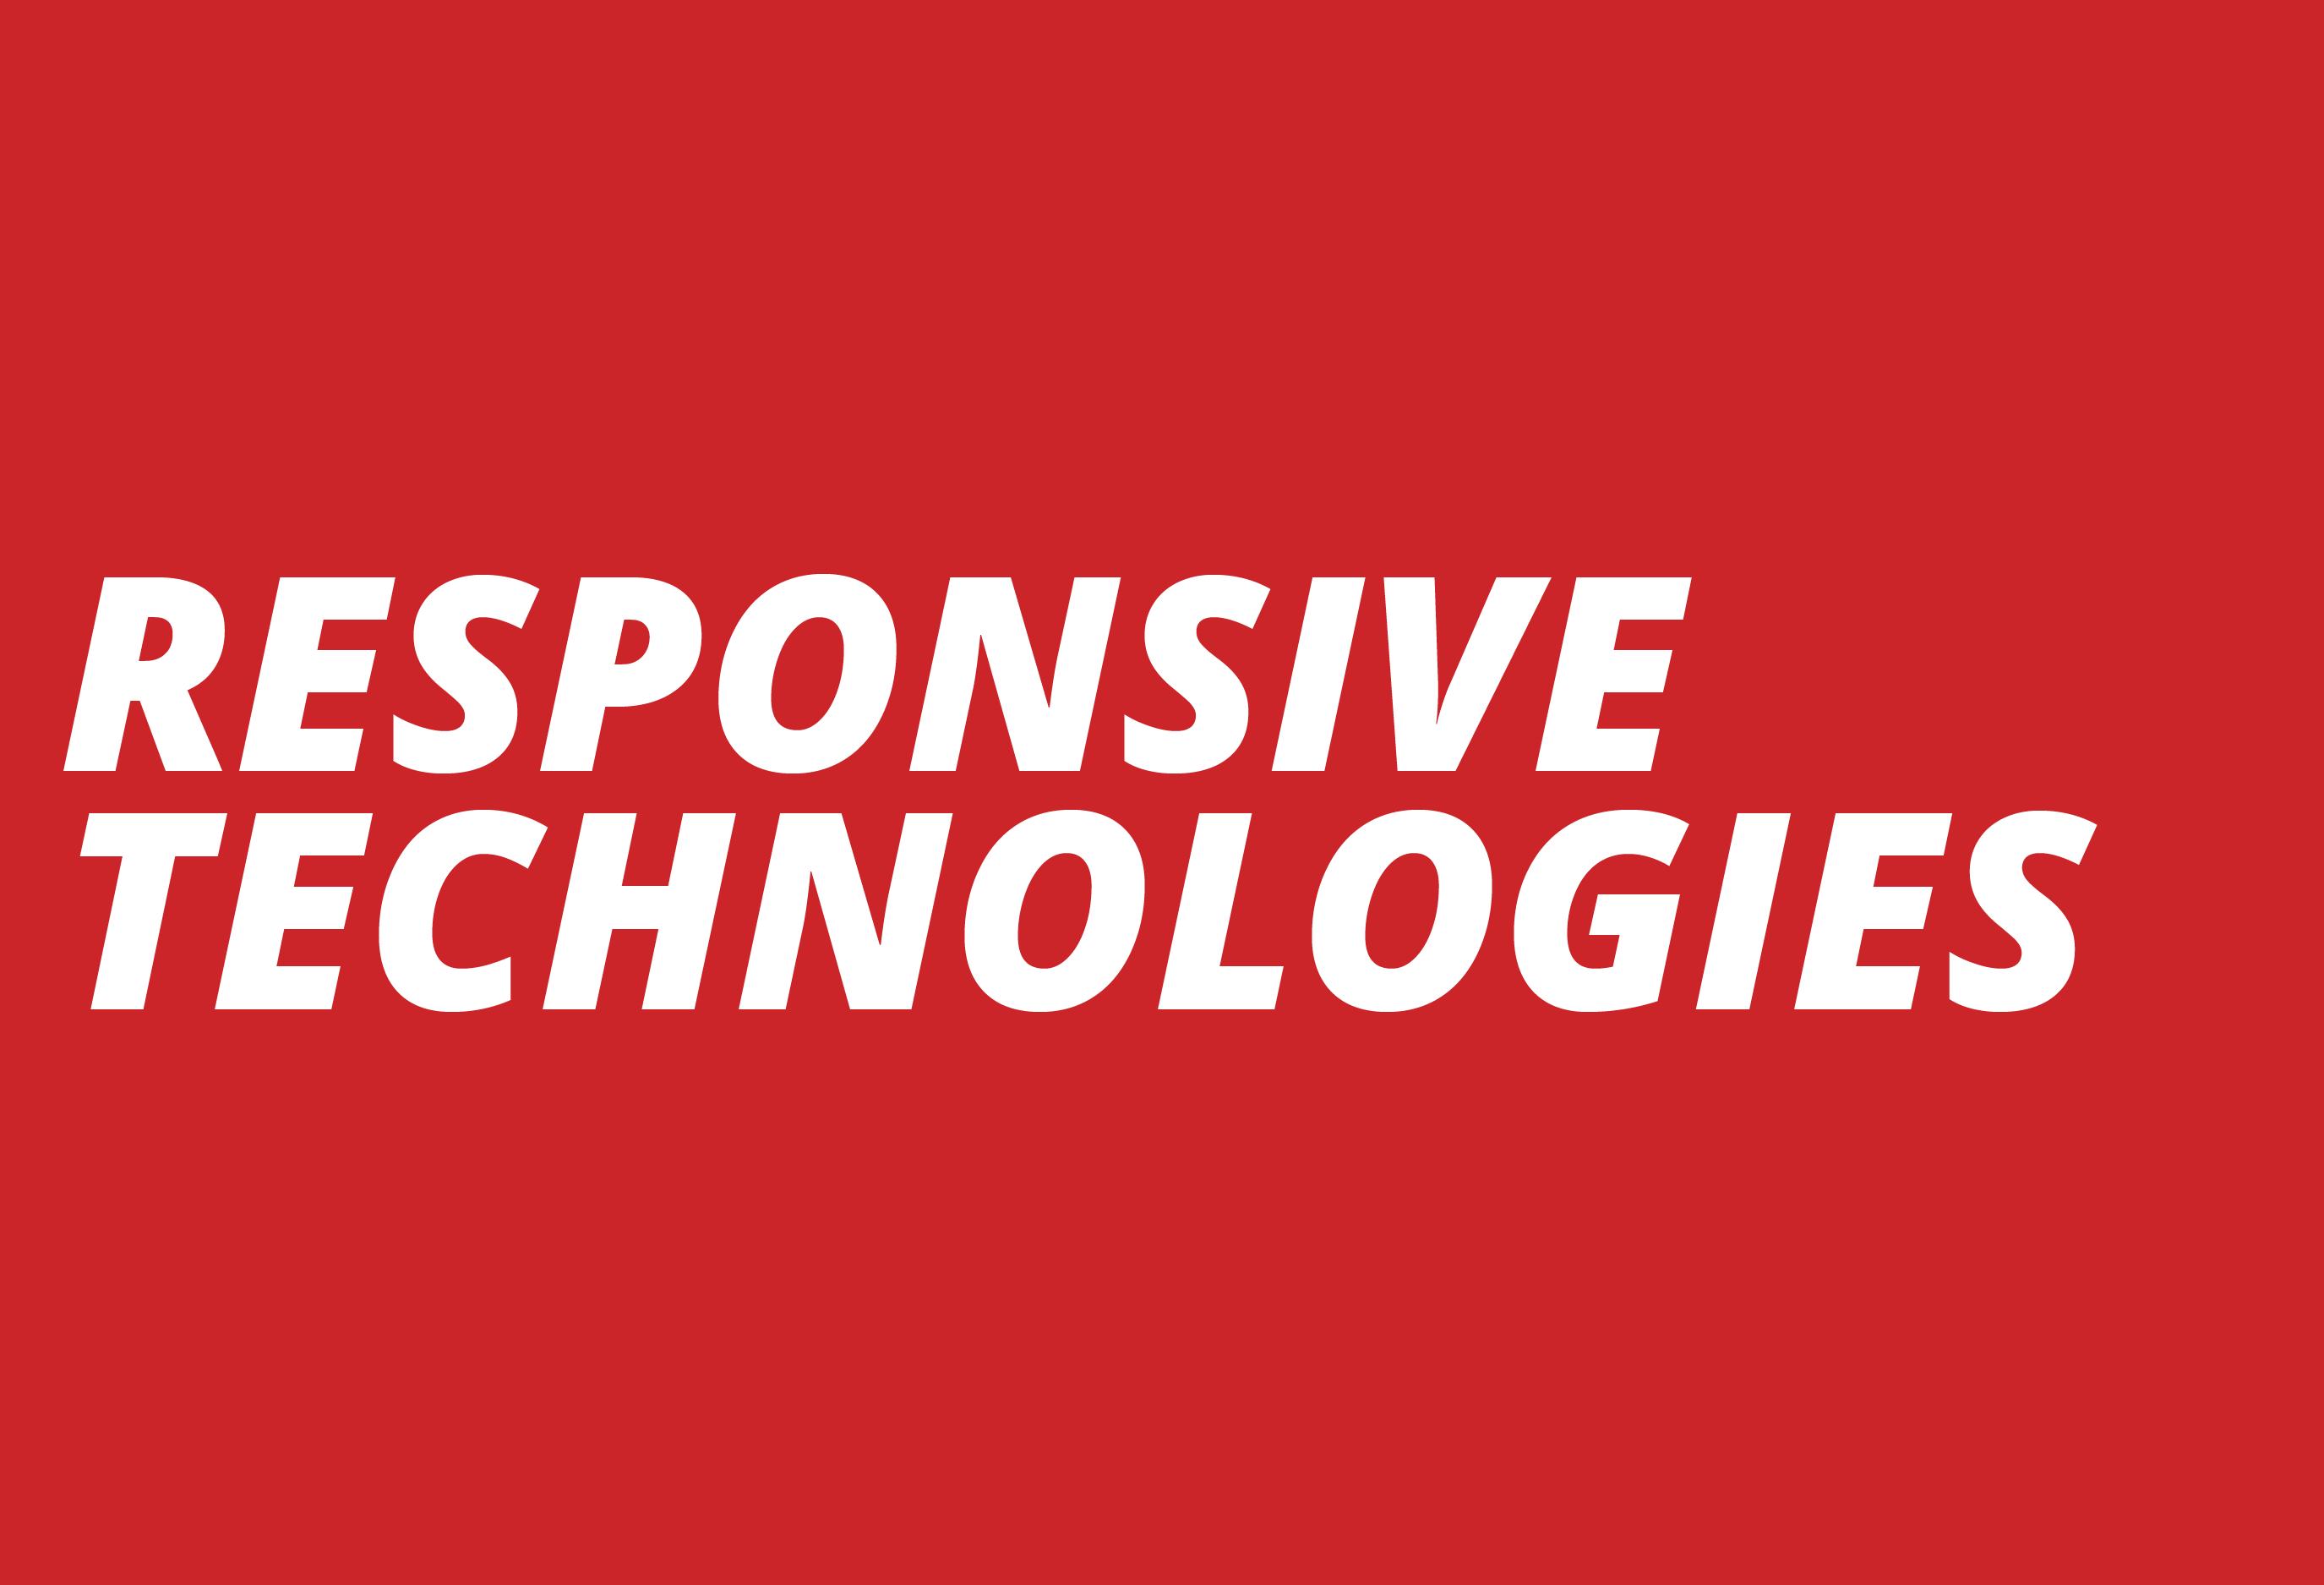 Responsive Technologies